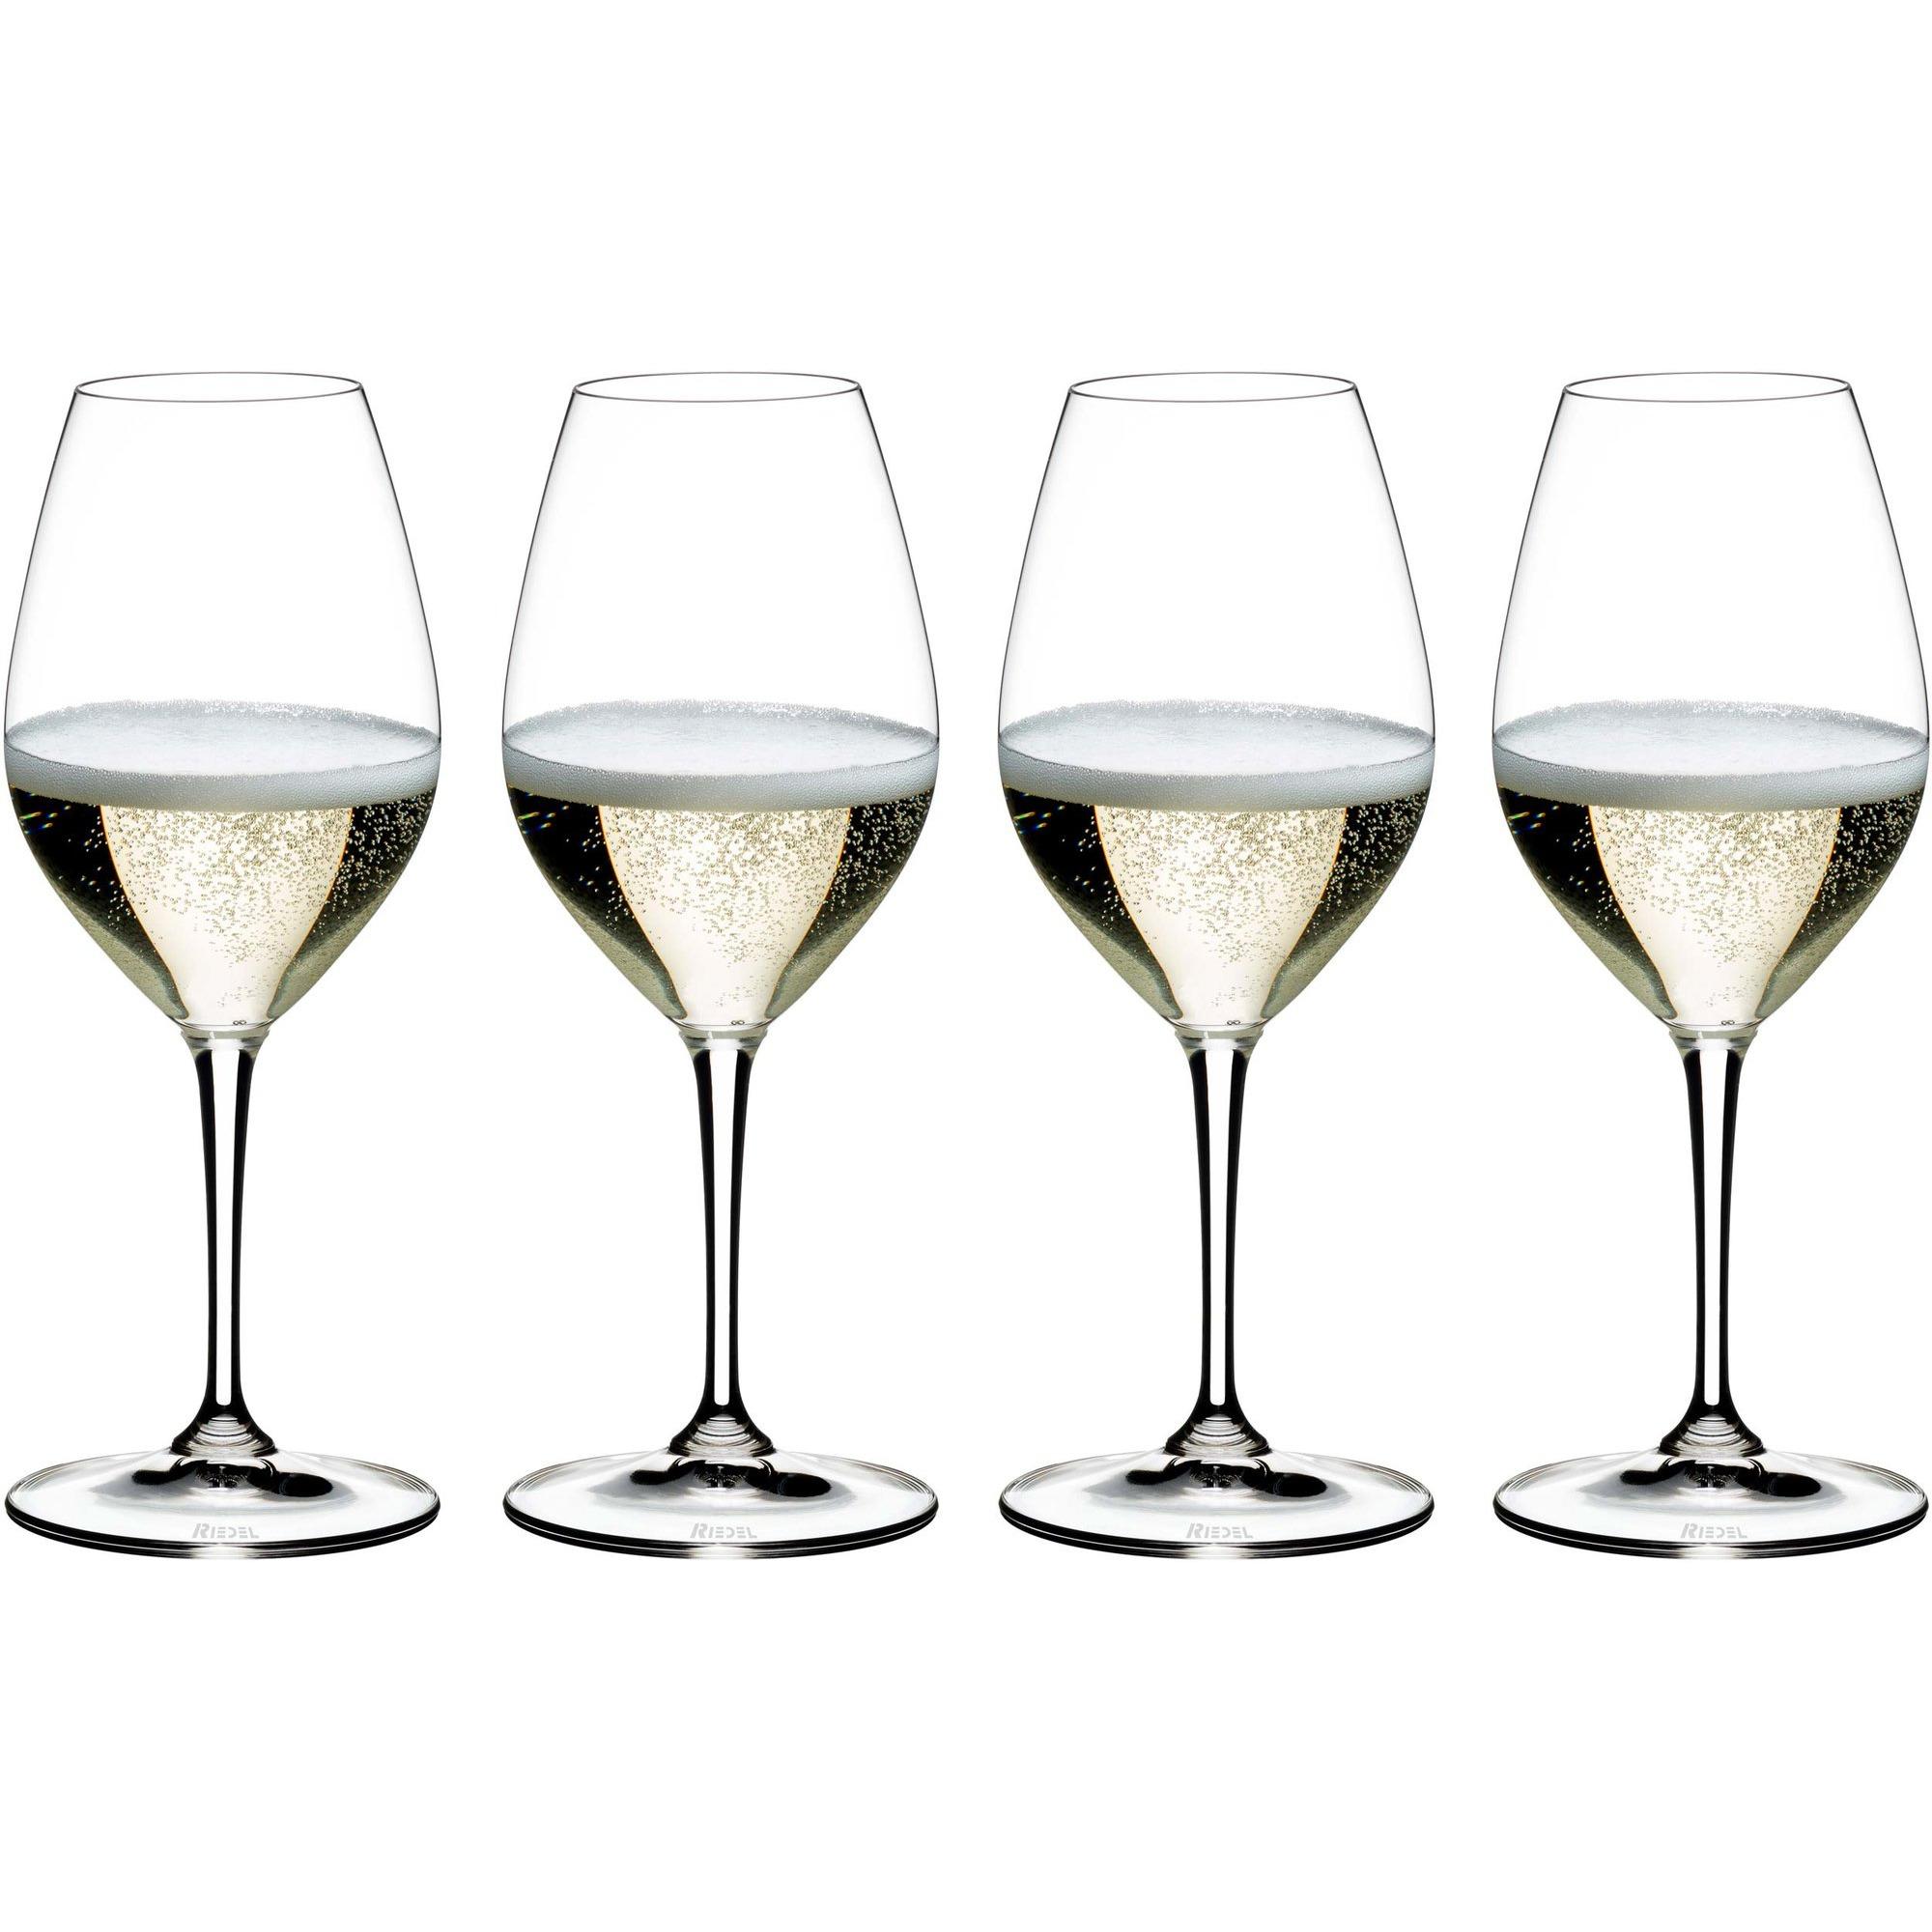 Riedel Vinum Champagneglas 4-pack